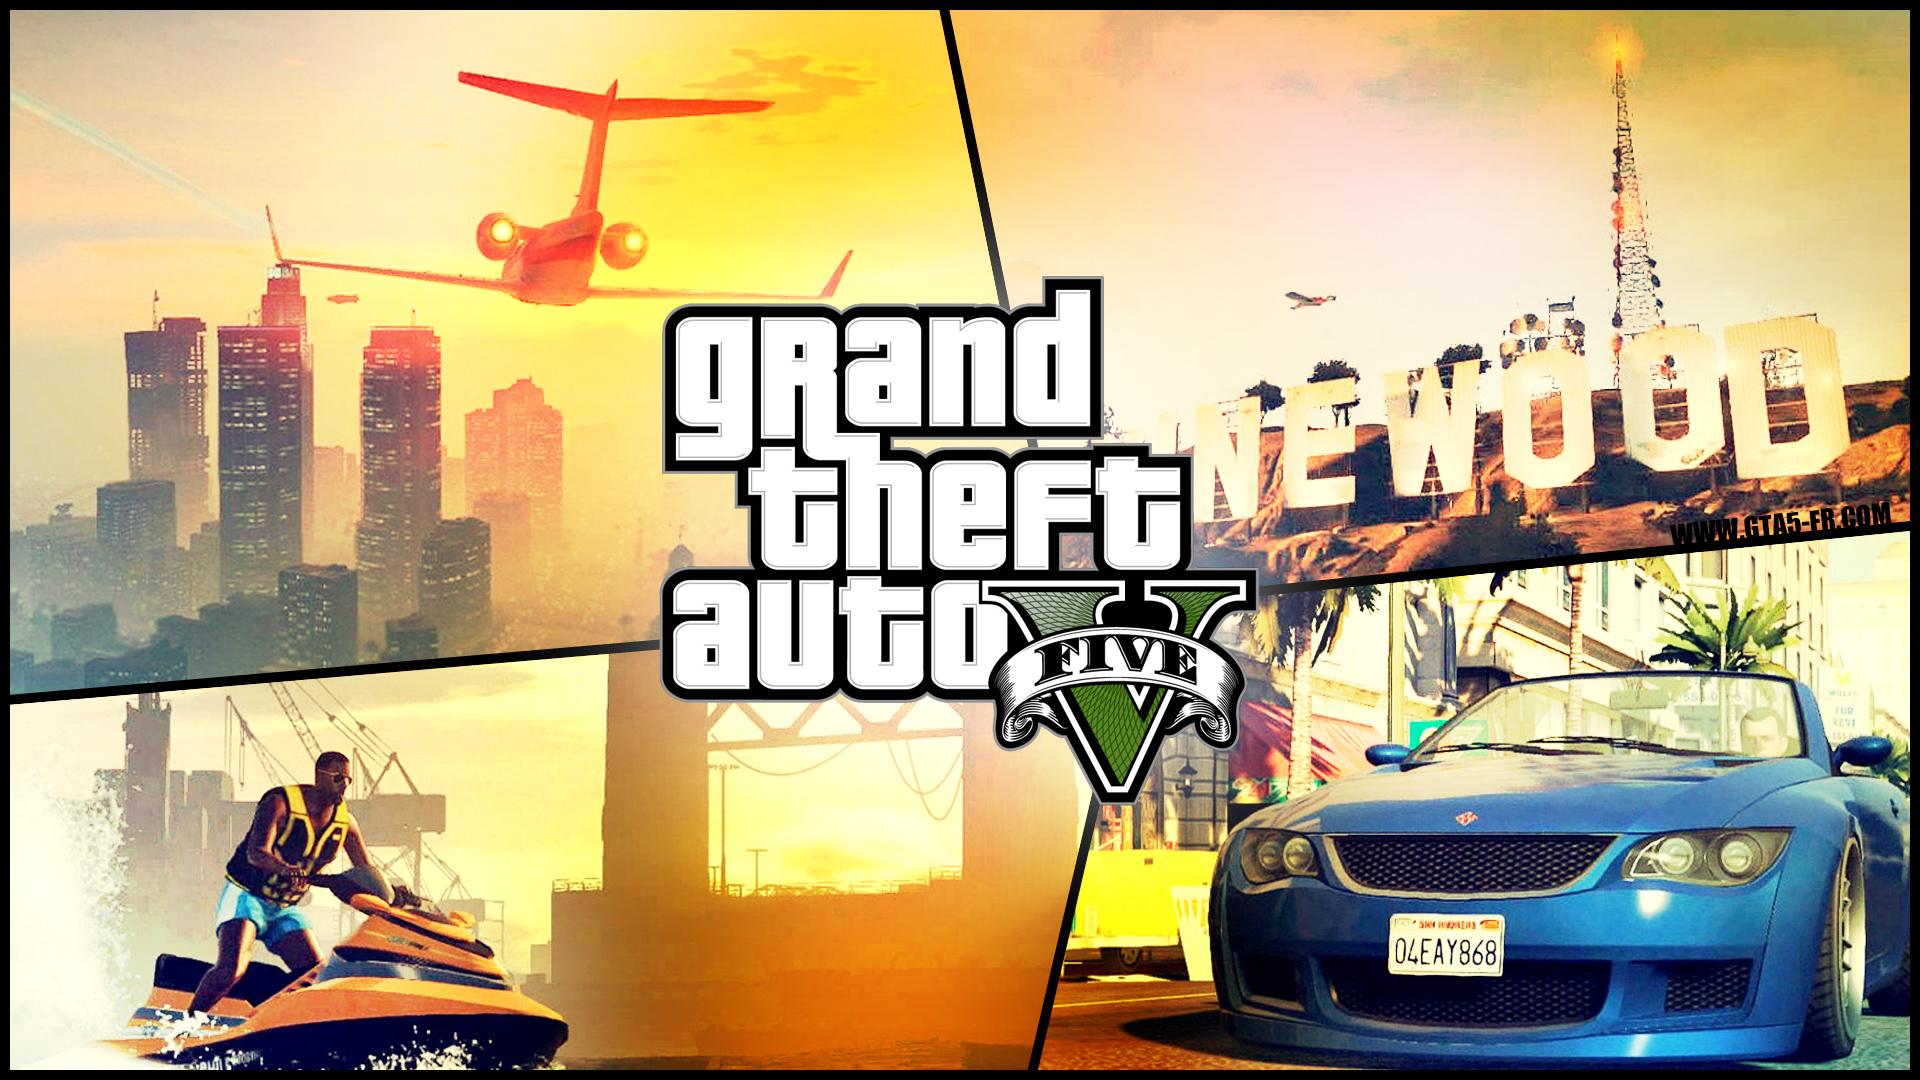 Gta 5 Grand Theft Auto V Rockstar 12 Wallpapers Desktop 1920x1080